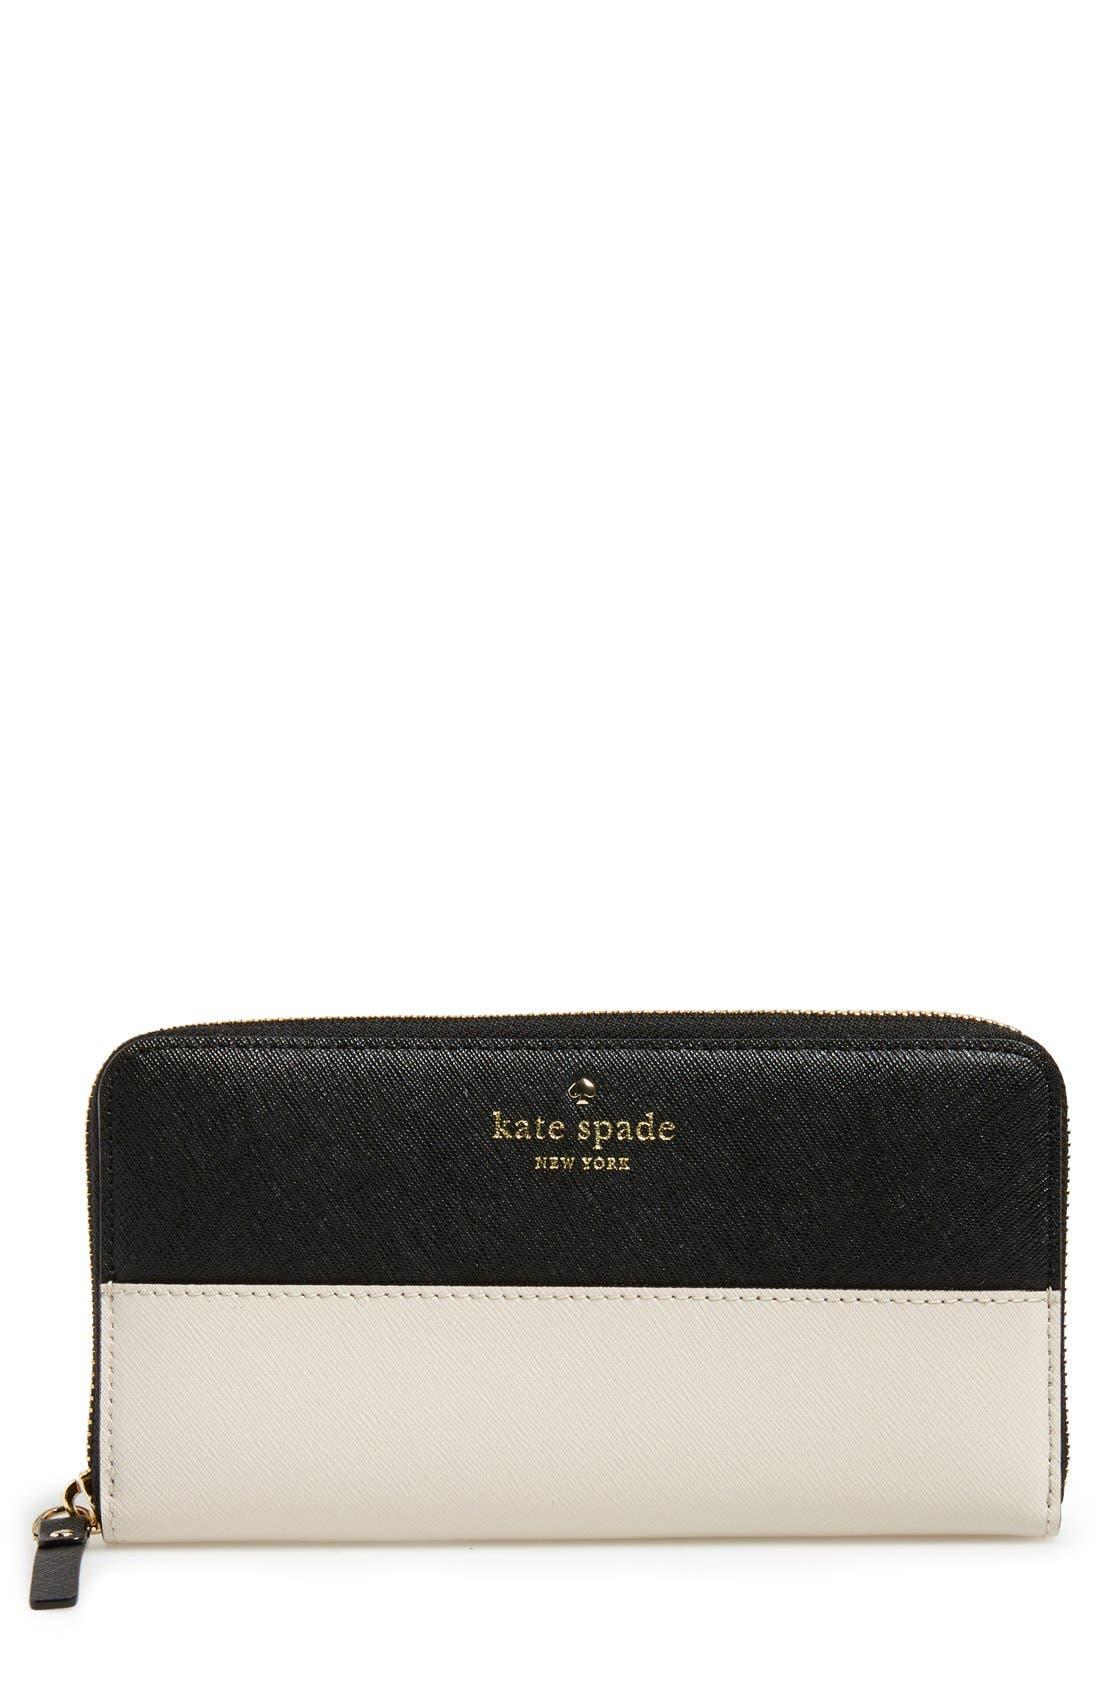 Alternate Image 1 Selected - kate spade new york 'cedar street - lacey' wallet